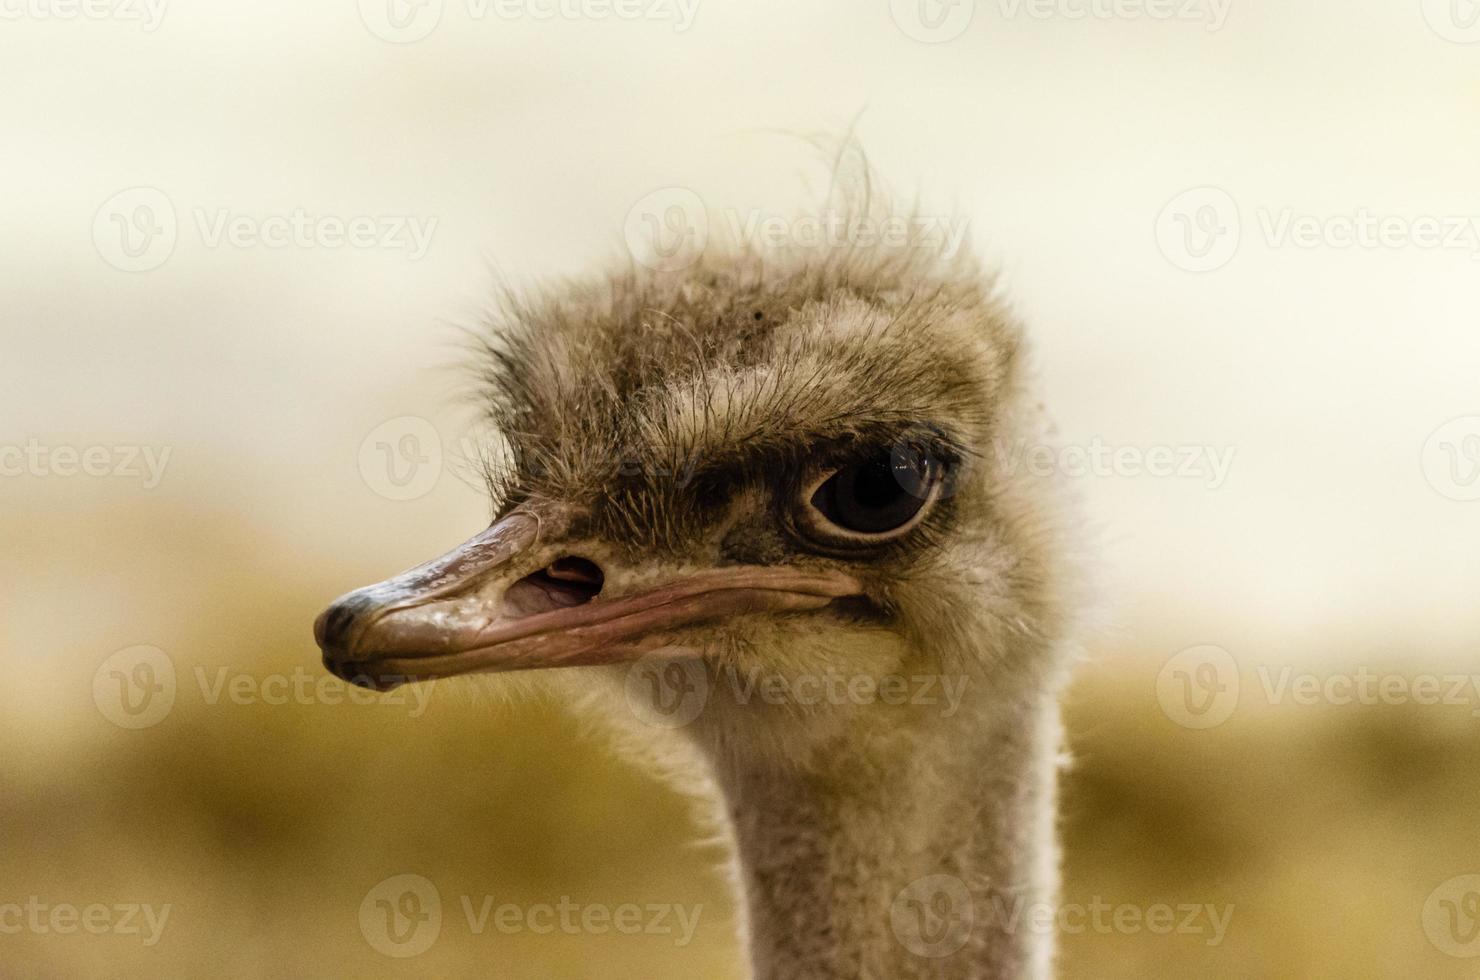 Retrato de cabeza de avestruz foto